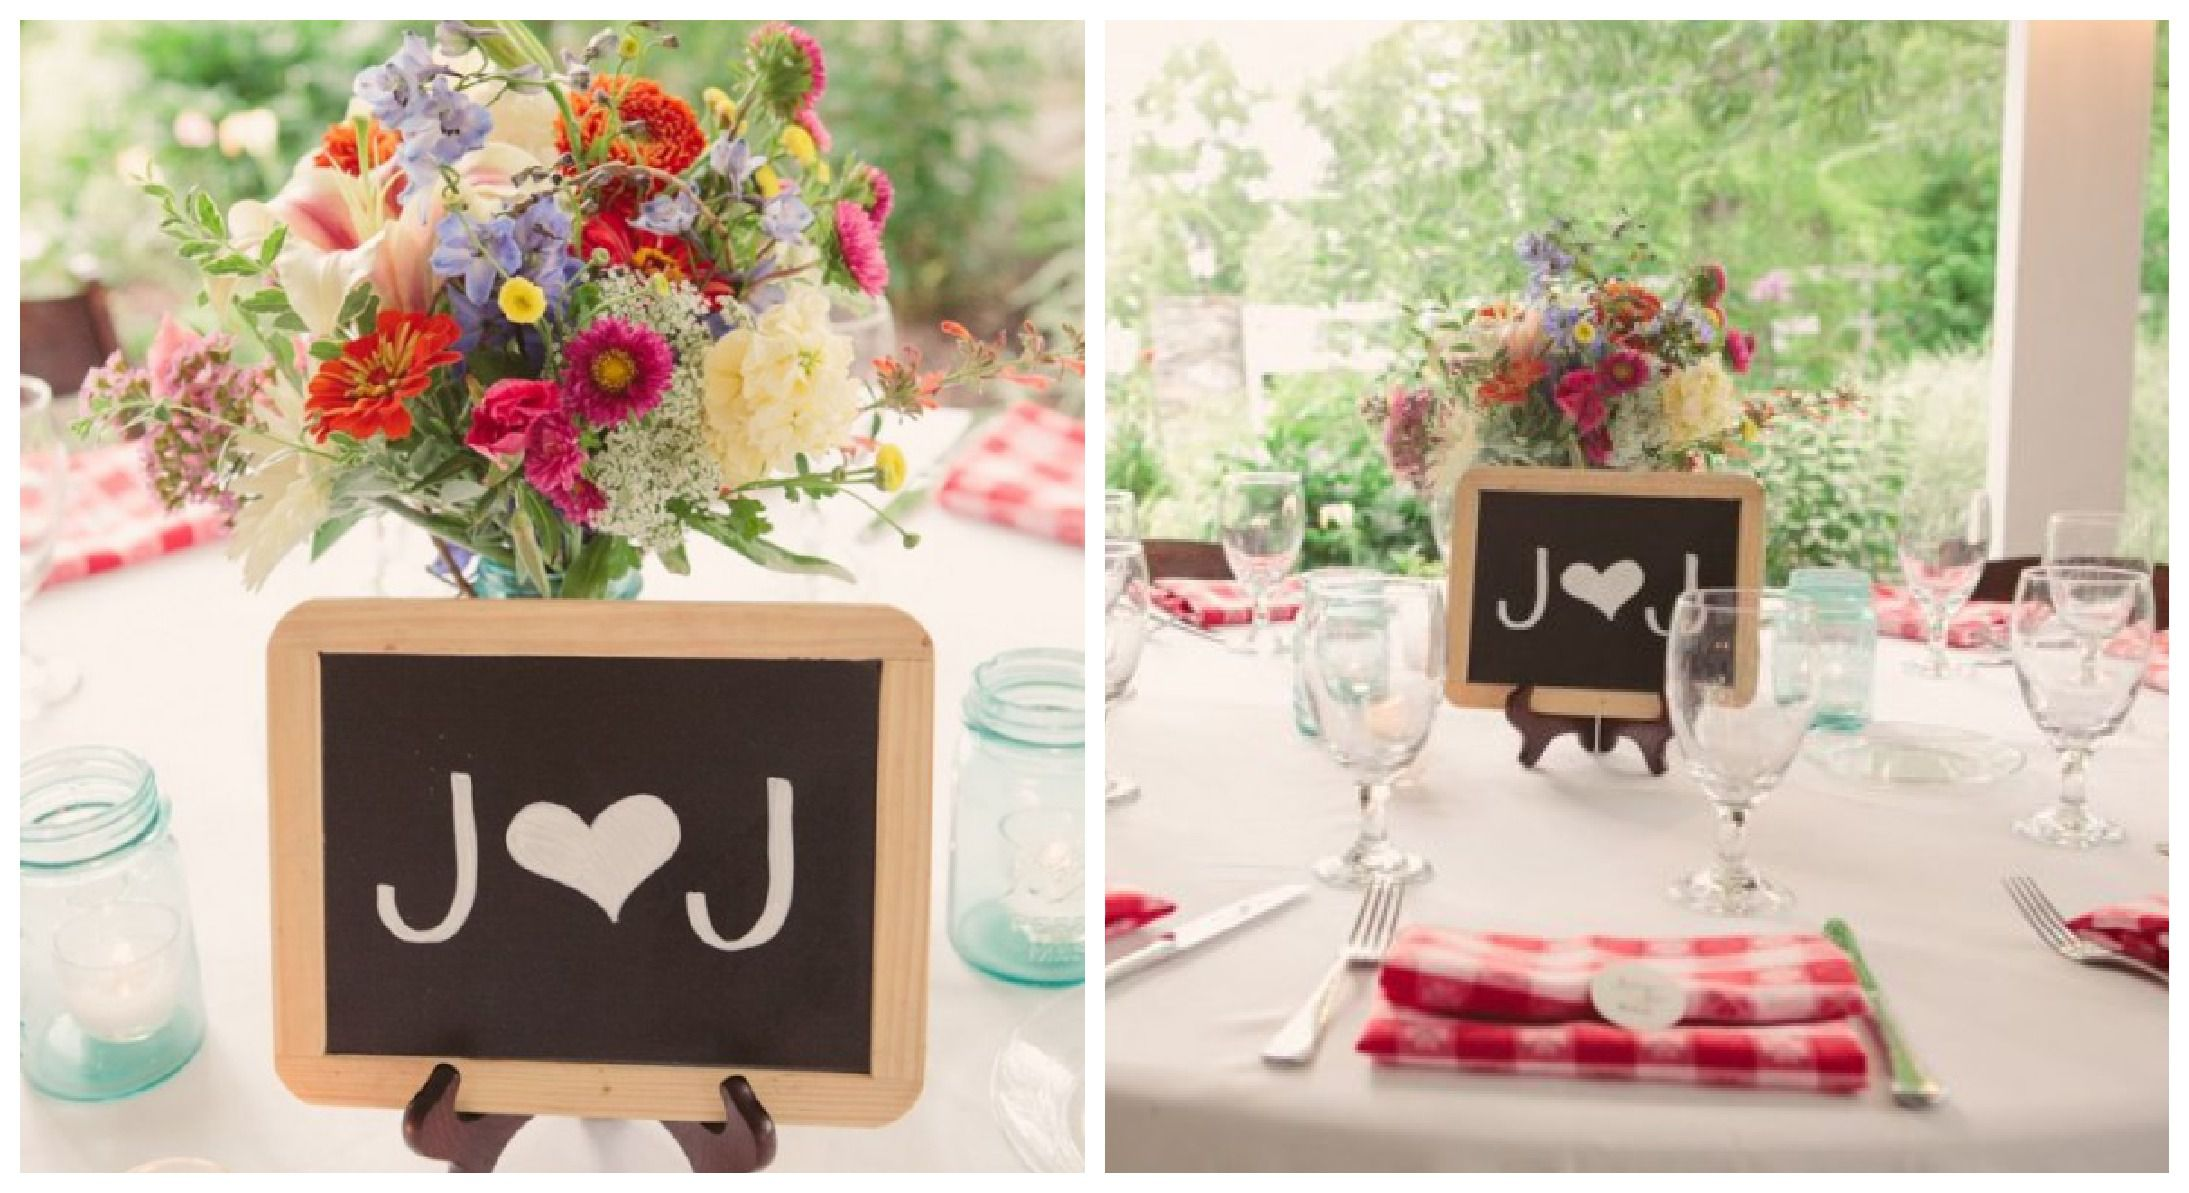 Wedding Centerpeice Ideas